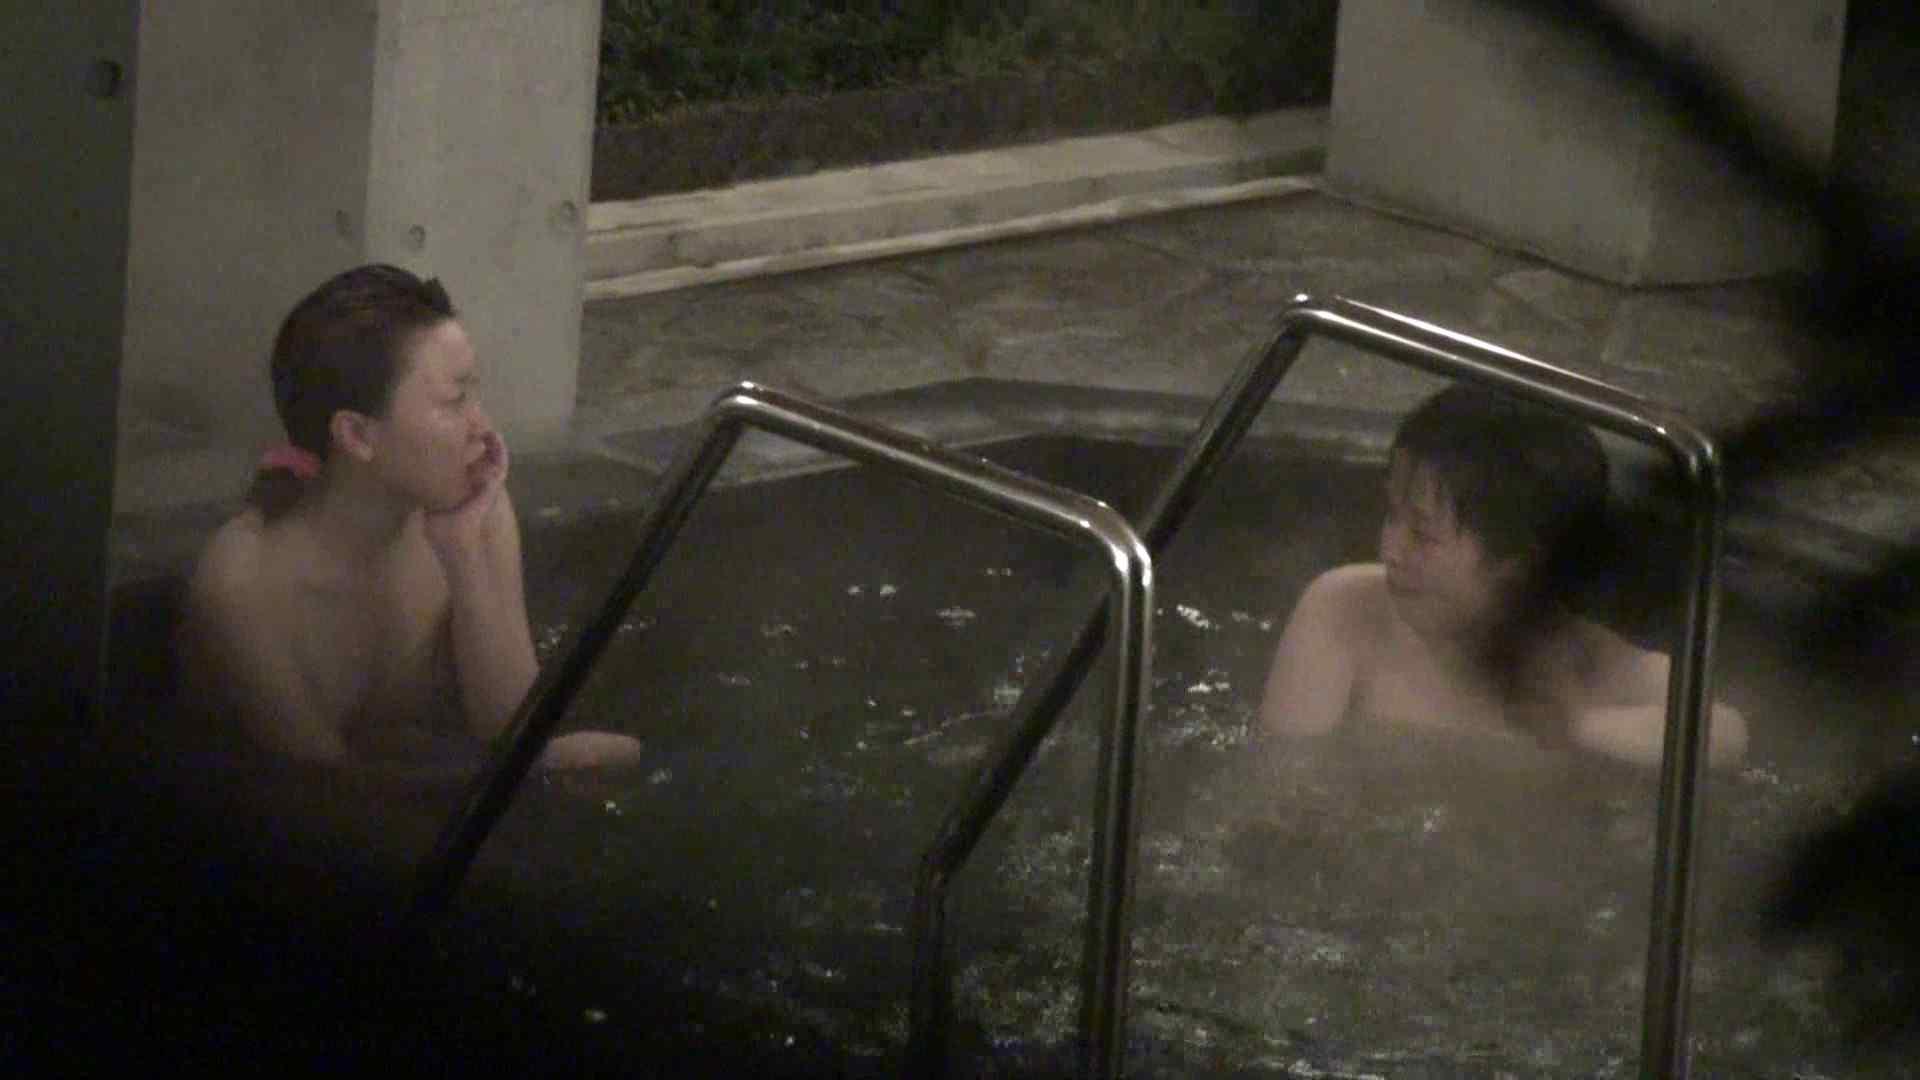 Aquaな露天風呂Vol.394 盗撮 | OLセックス  99画像 43